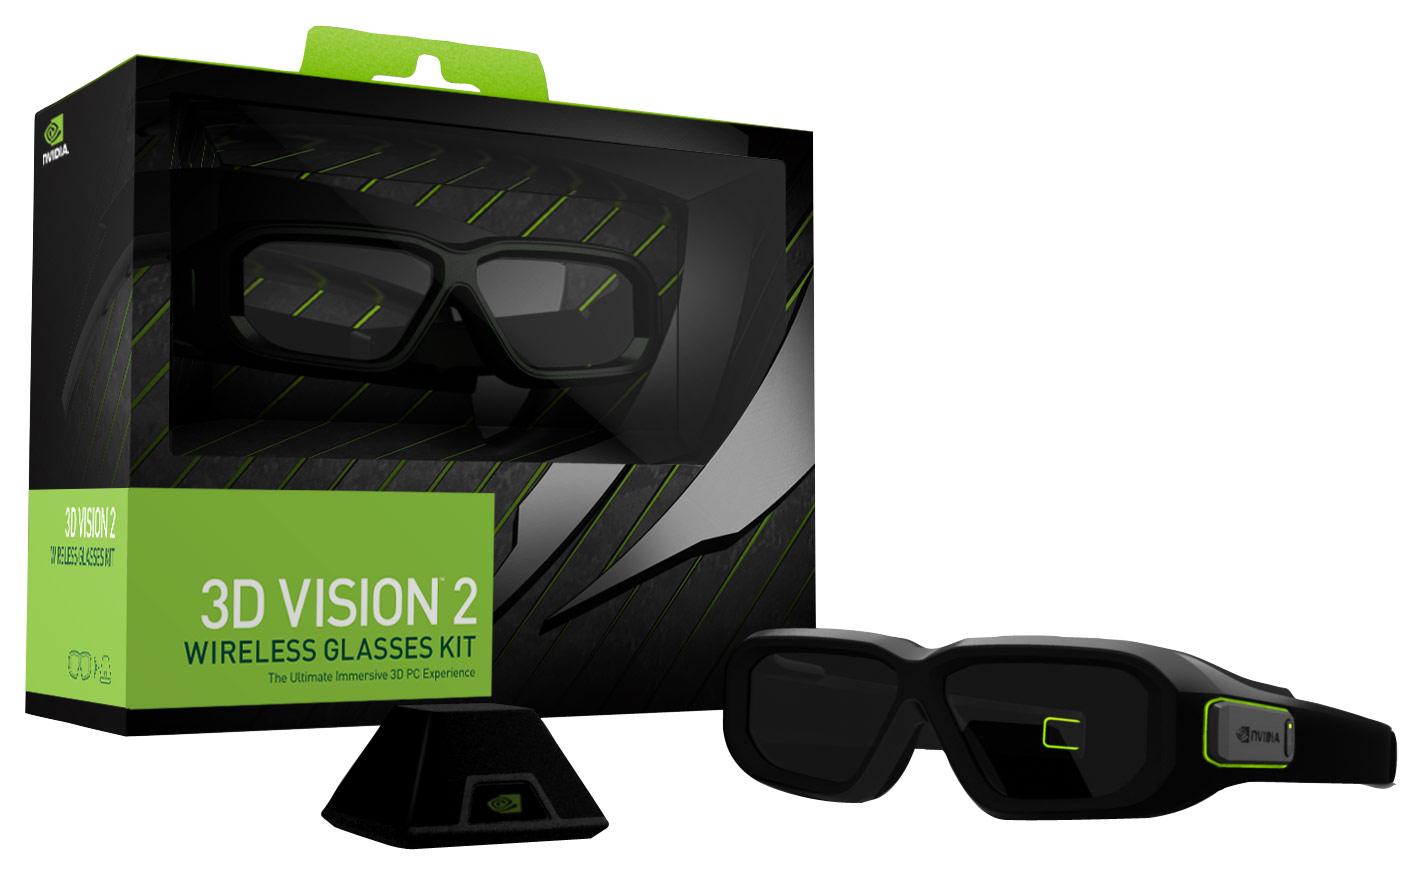 NVIDIA - 3D Vision 2 Wireless 3D Glasses - Black 6761832